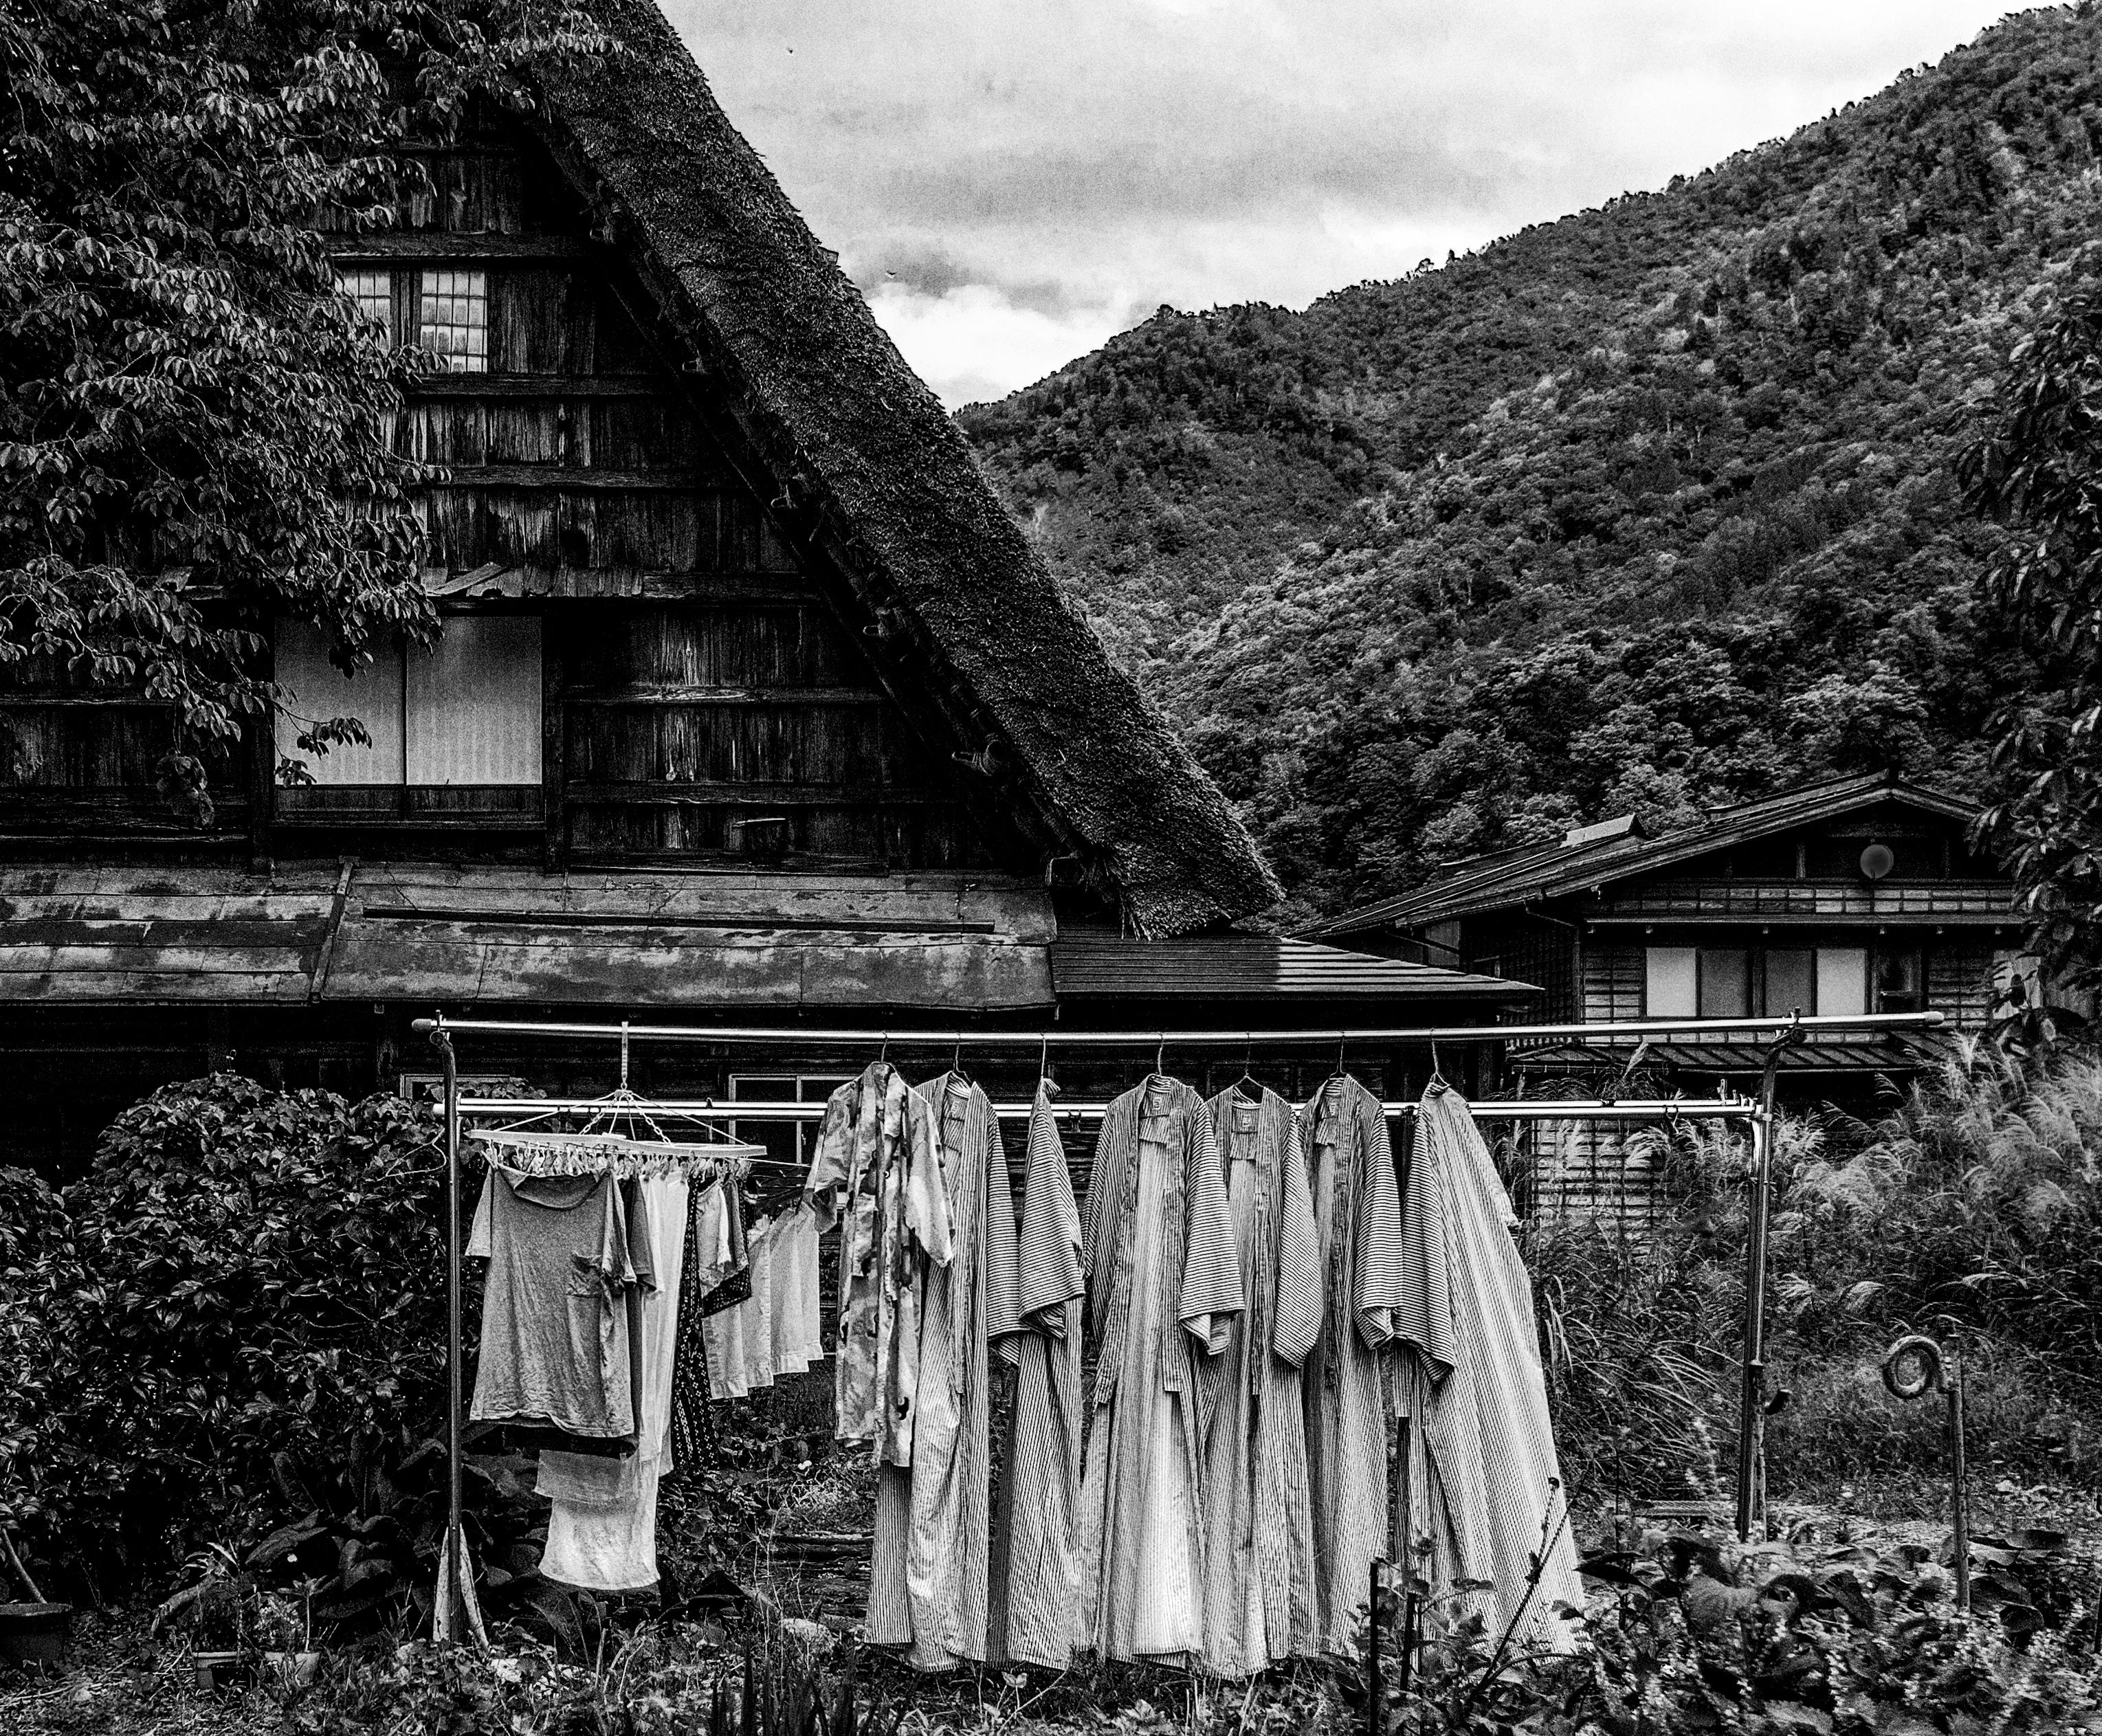 laundryday-1559754680-53.jpg